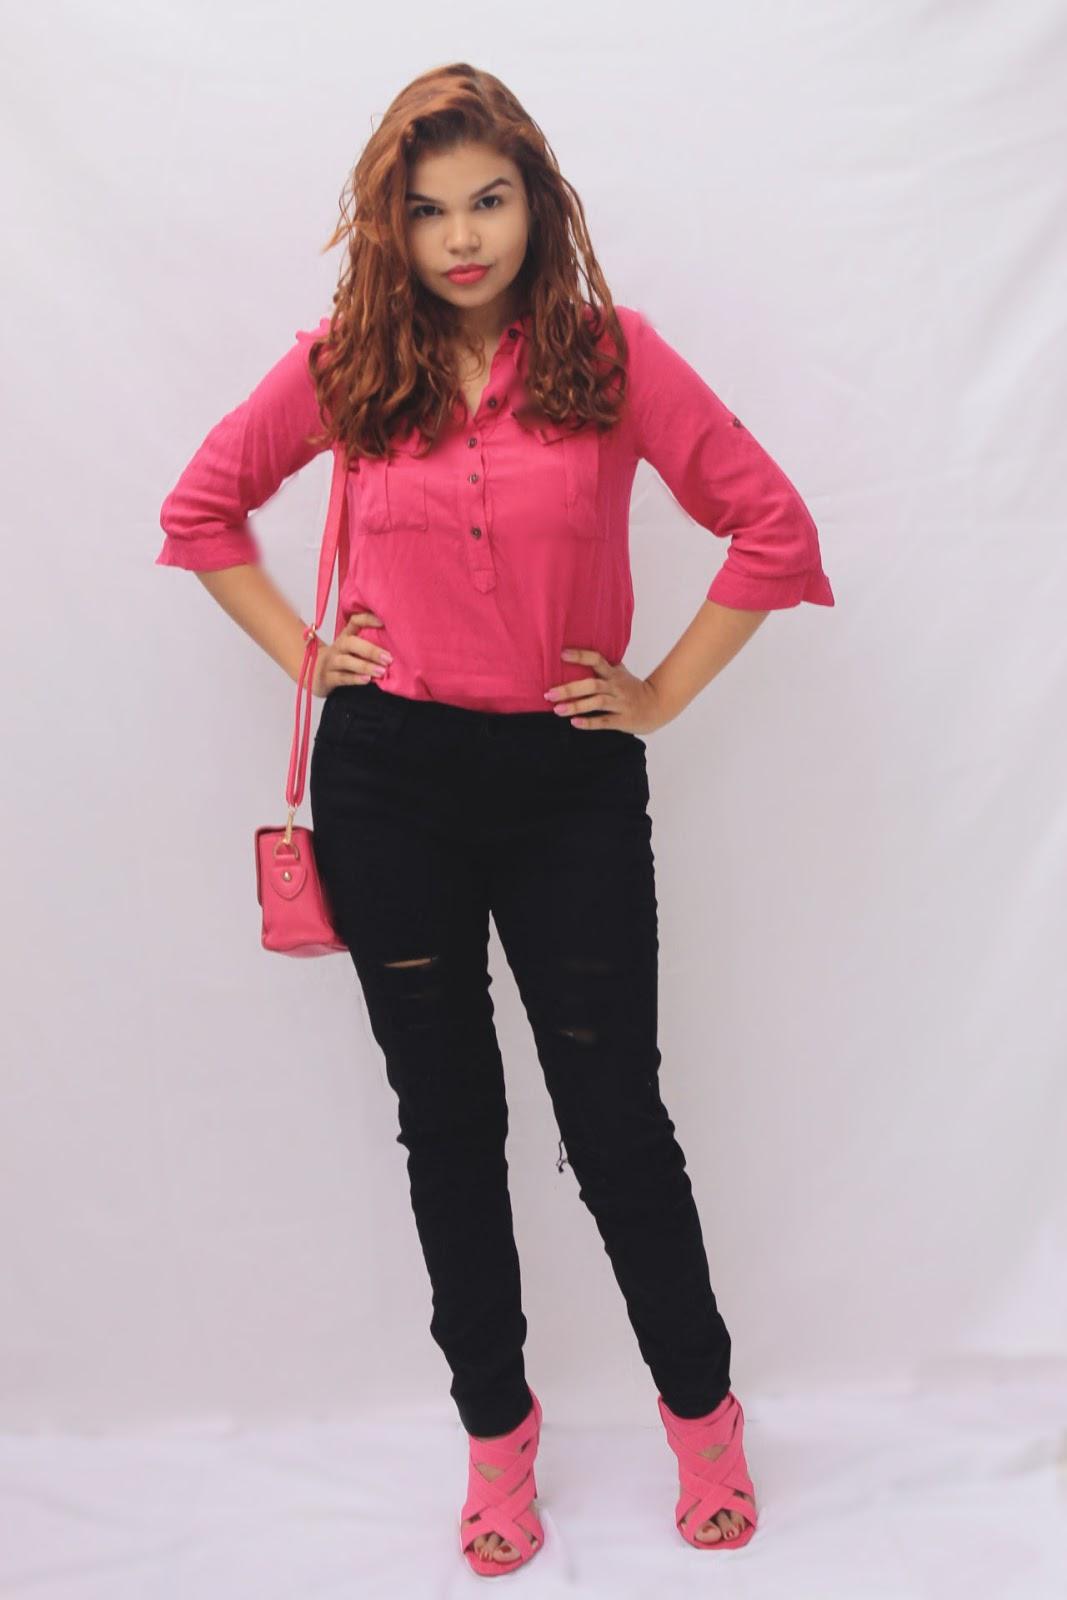 look barbie, look calça, look preto e rosa, look outubro rosa, look brechó, calça preta da china, salto rosa, look elegante, look sério arrumadinho, cabelo ondulado, blogueira ruiva